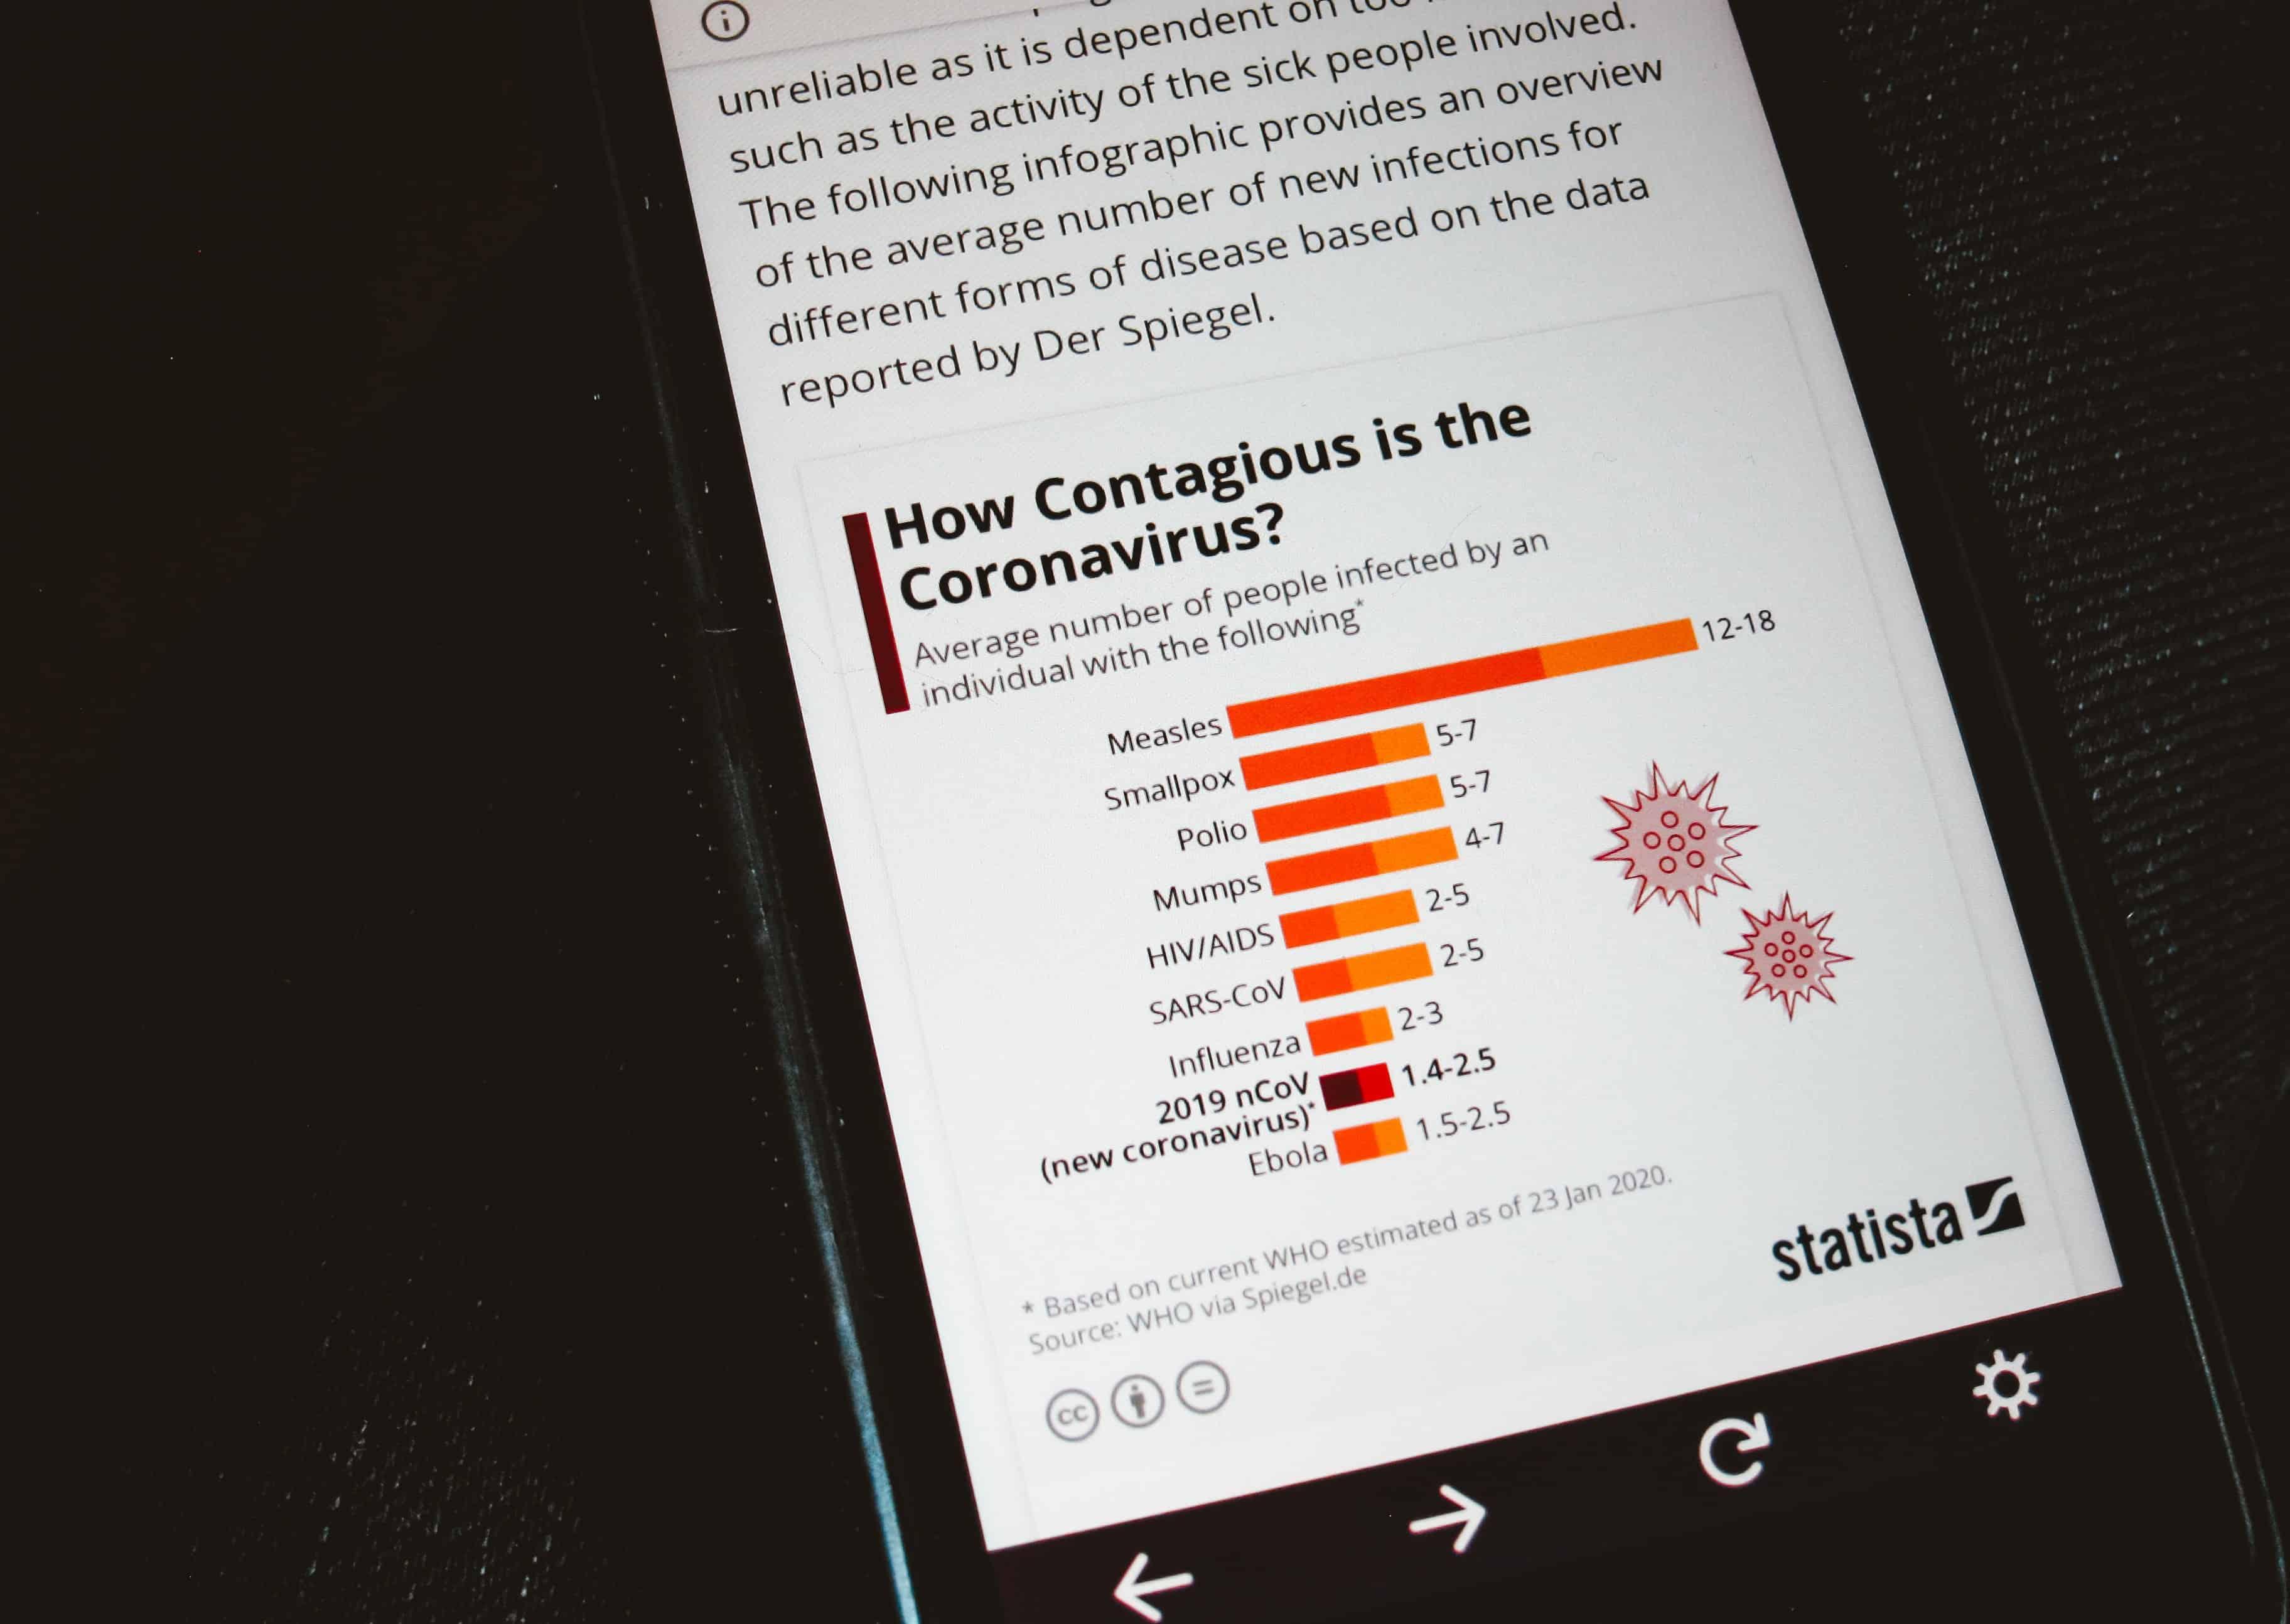 Impact of the coronavirus on the fashion industry